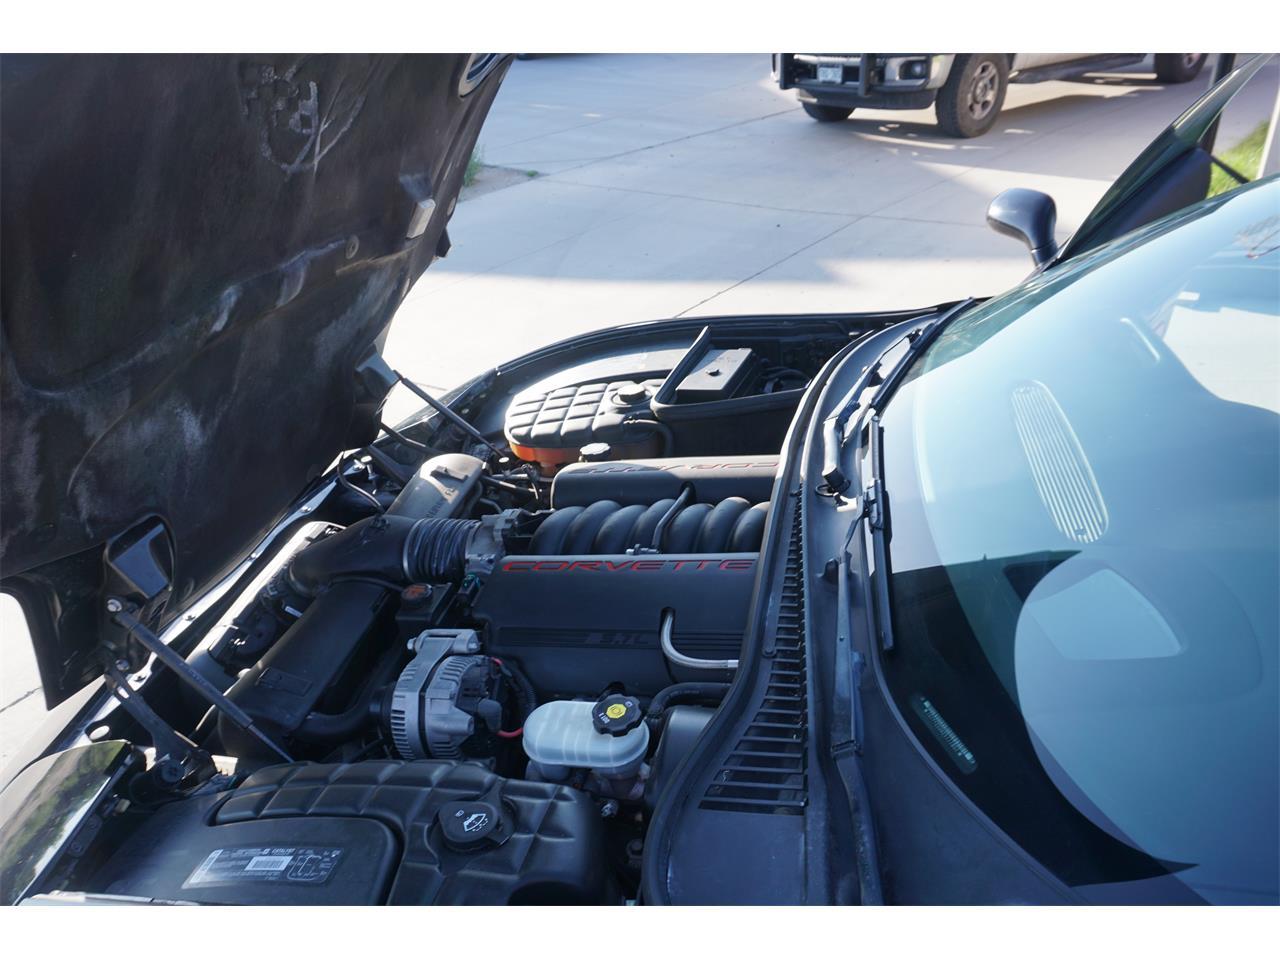 Large Picture of '02 Chevrolet Corvette located in Colorado - $15,000.00 - Q8JM